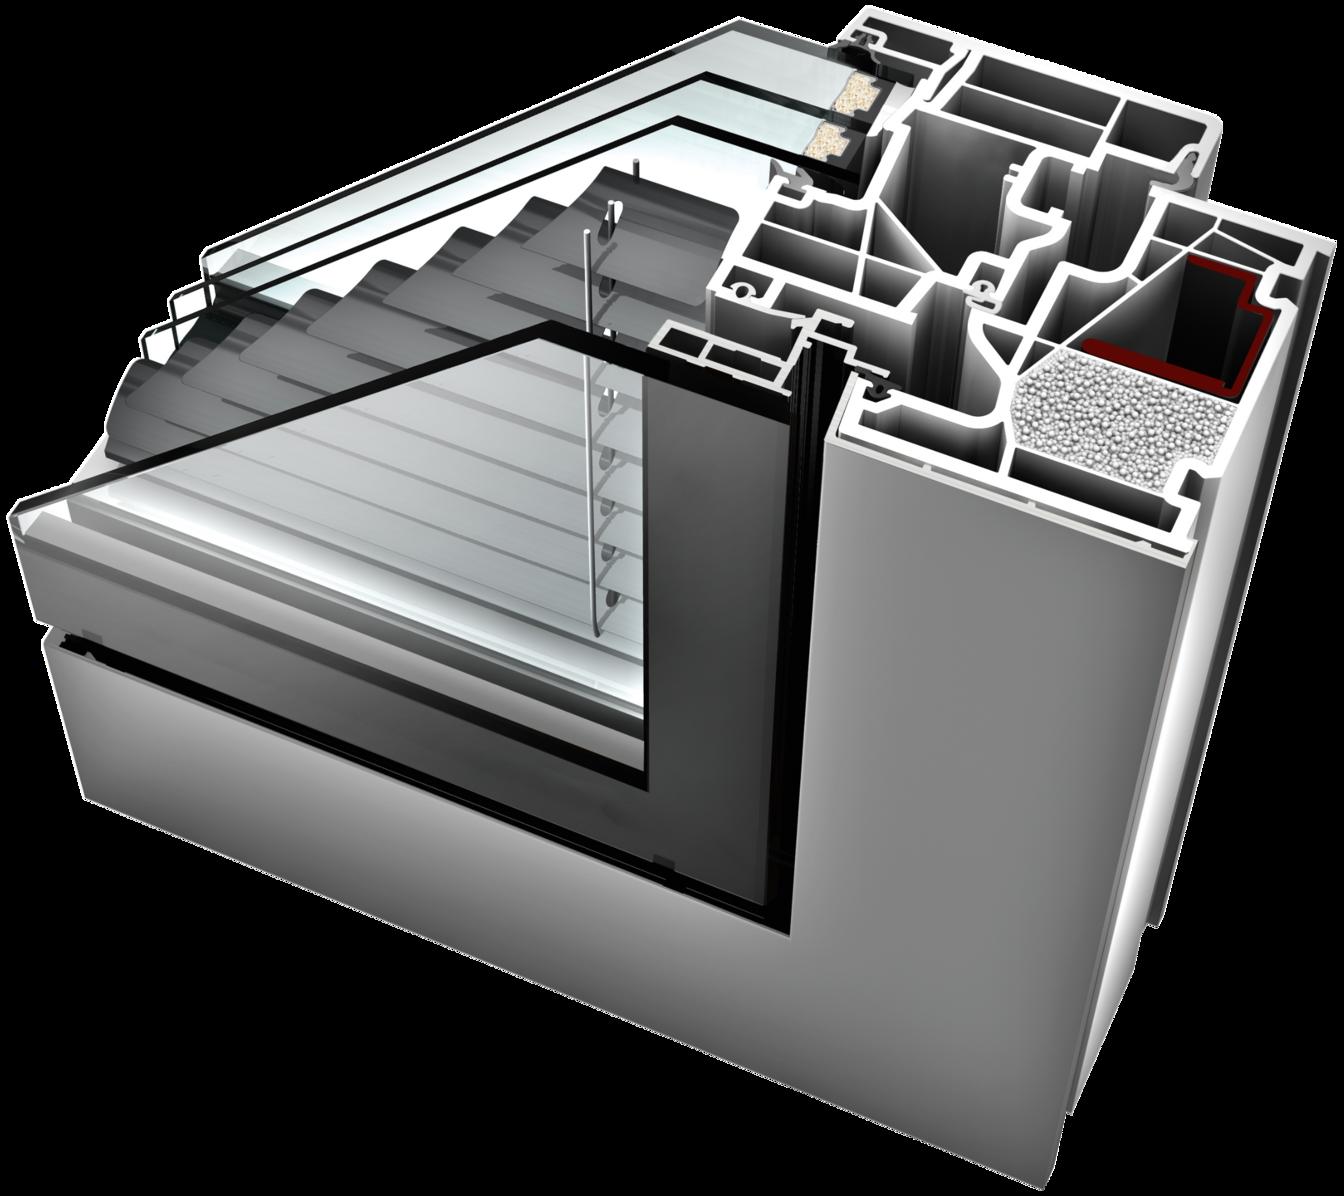 Kv 440 kunststoff aluminium fenster internorm detail for Internorm fenster